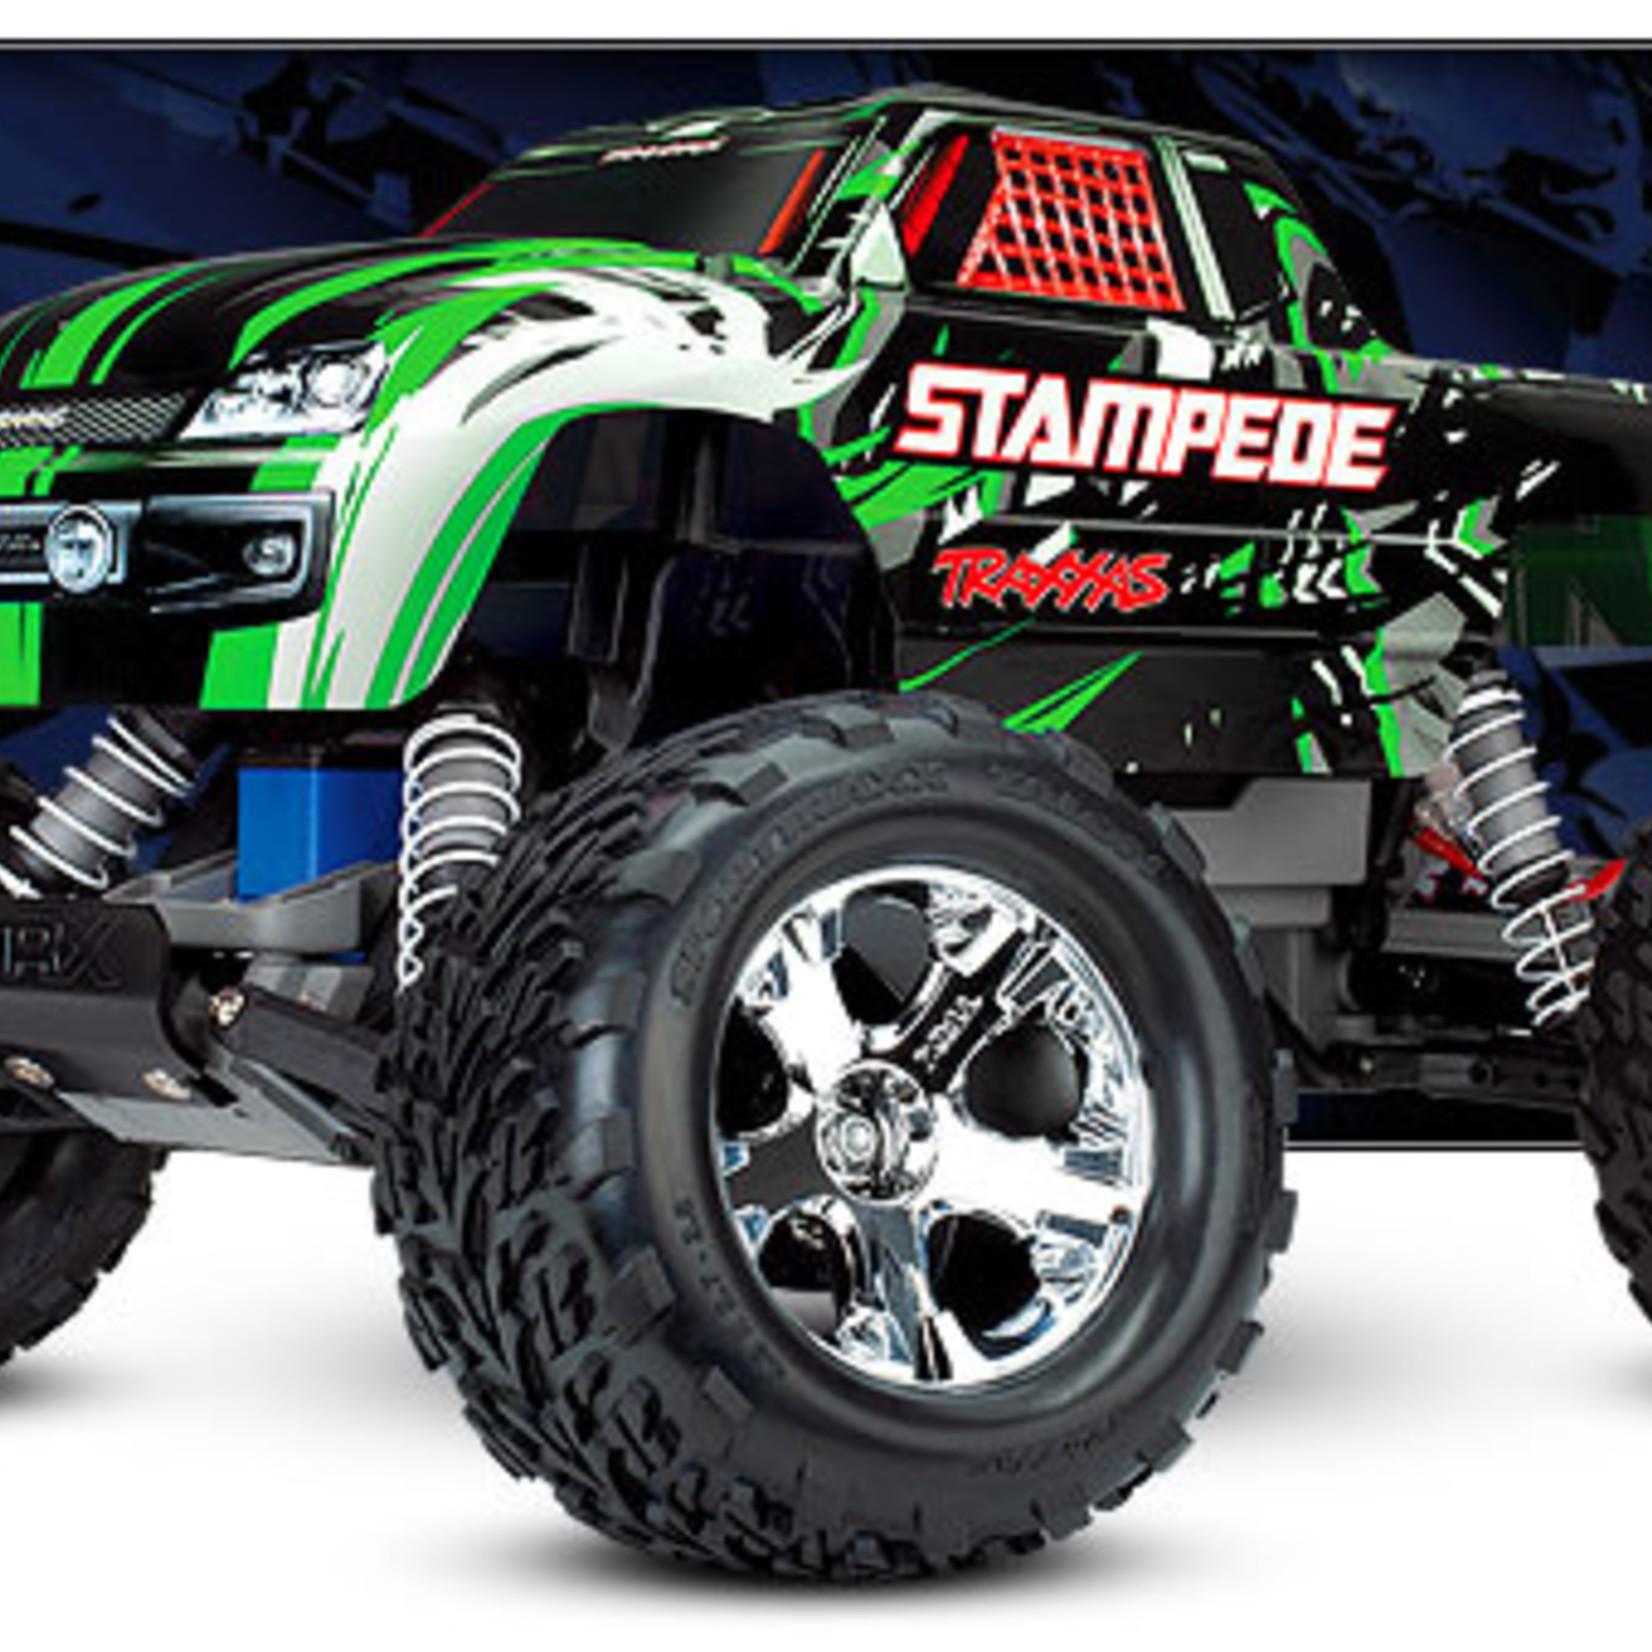 Traxxas TRA36054-4 Traxxas Stampede: 1/10 Monster Truck